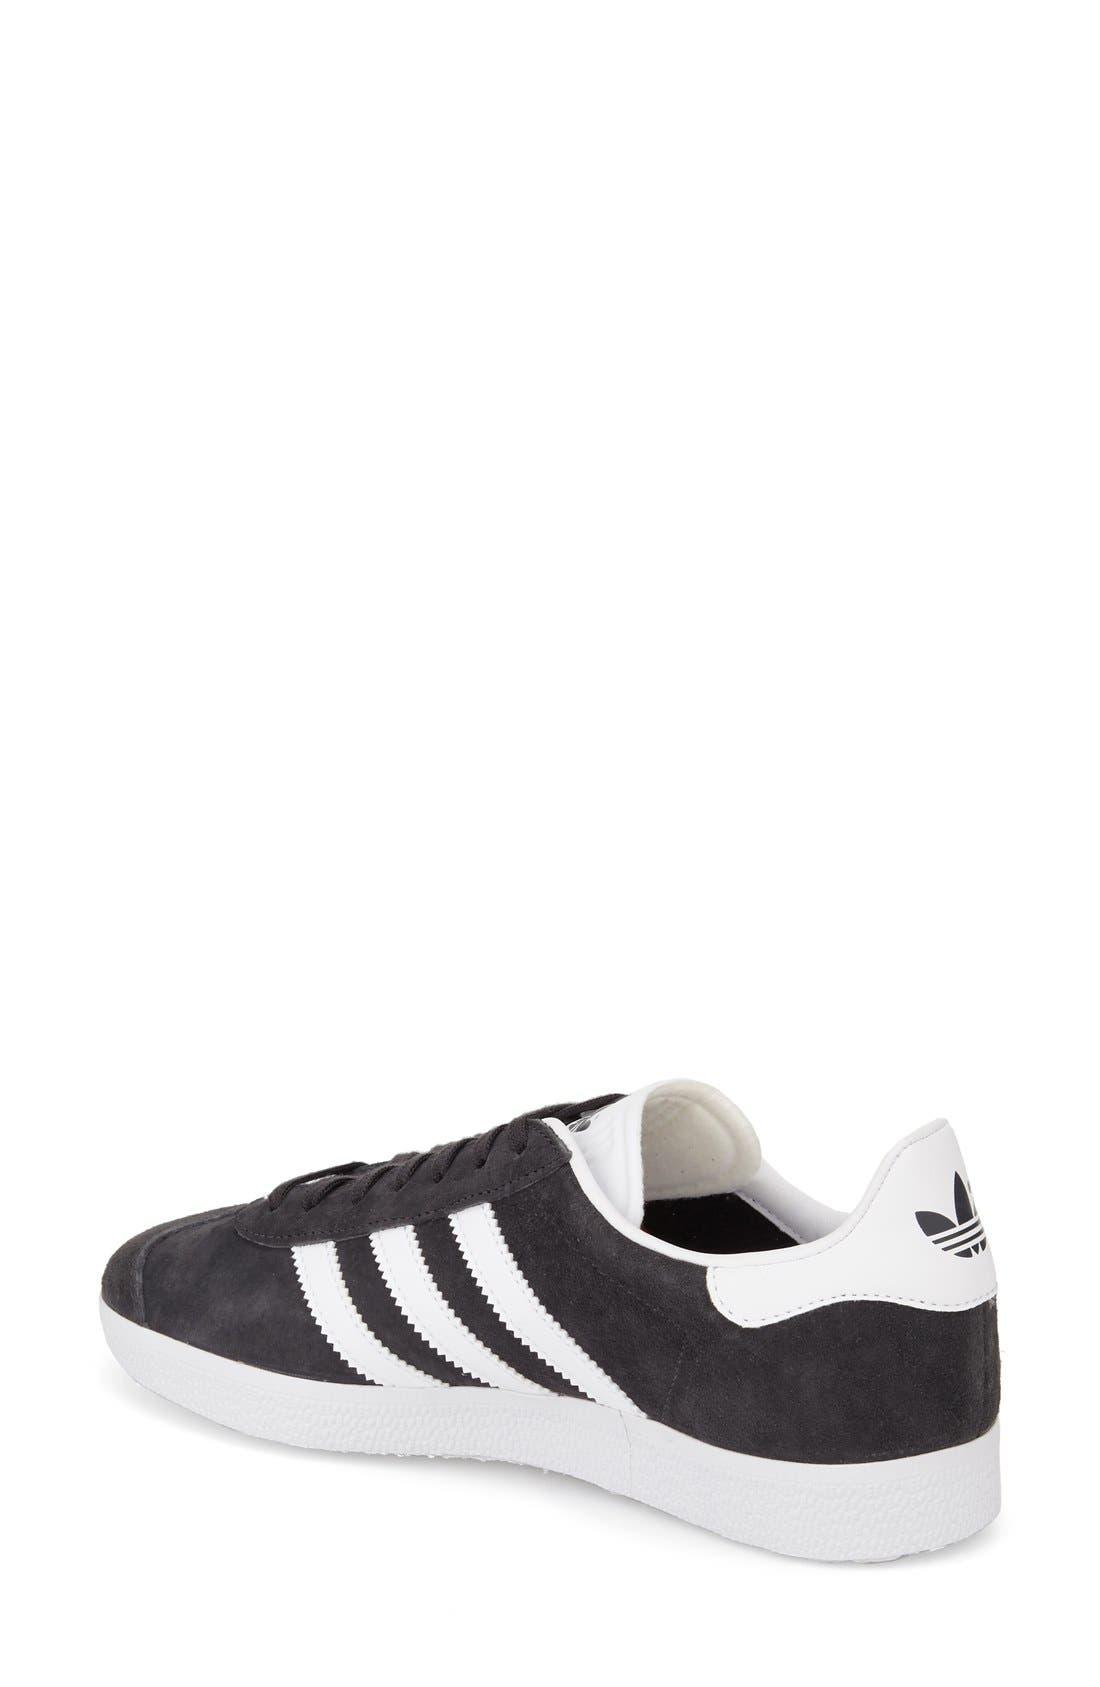 Gazelle Sneaker,                             Alternate thumbnail 2, color,                             Solid Grey